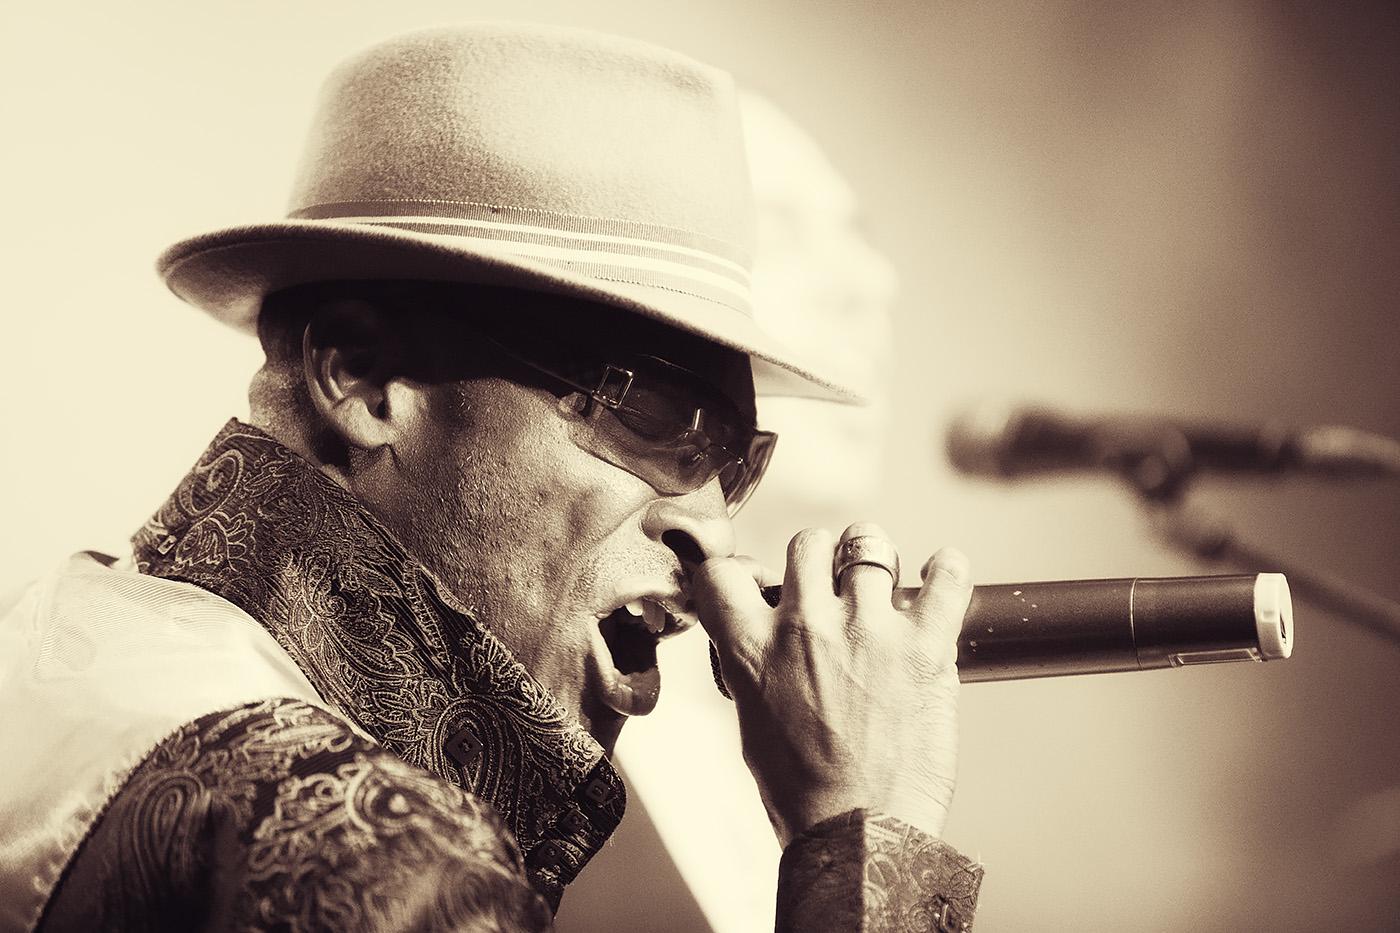 Keith Sanders The Gypsys